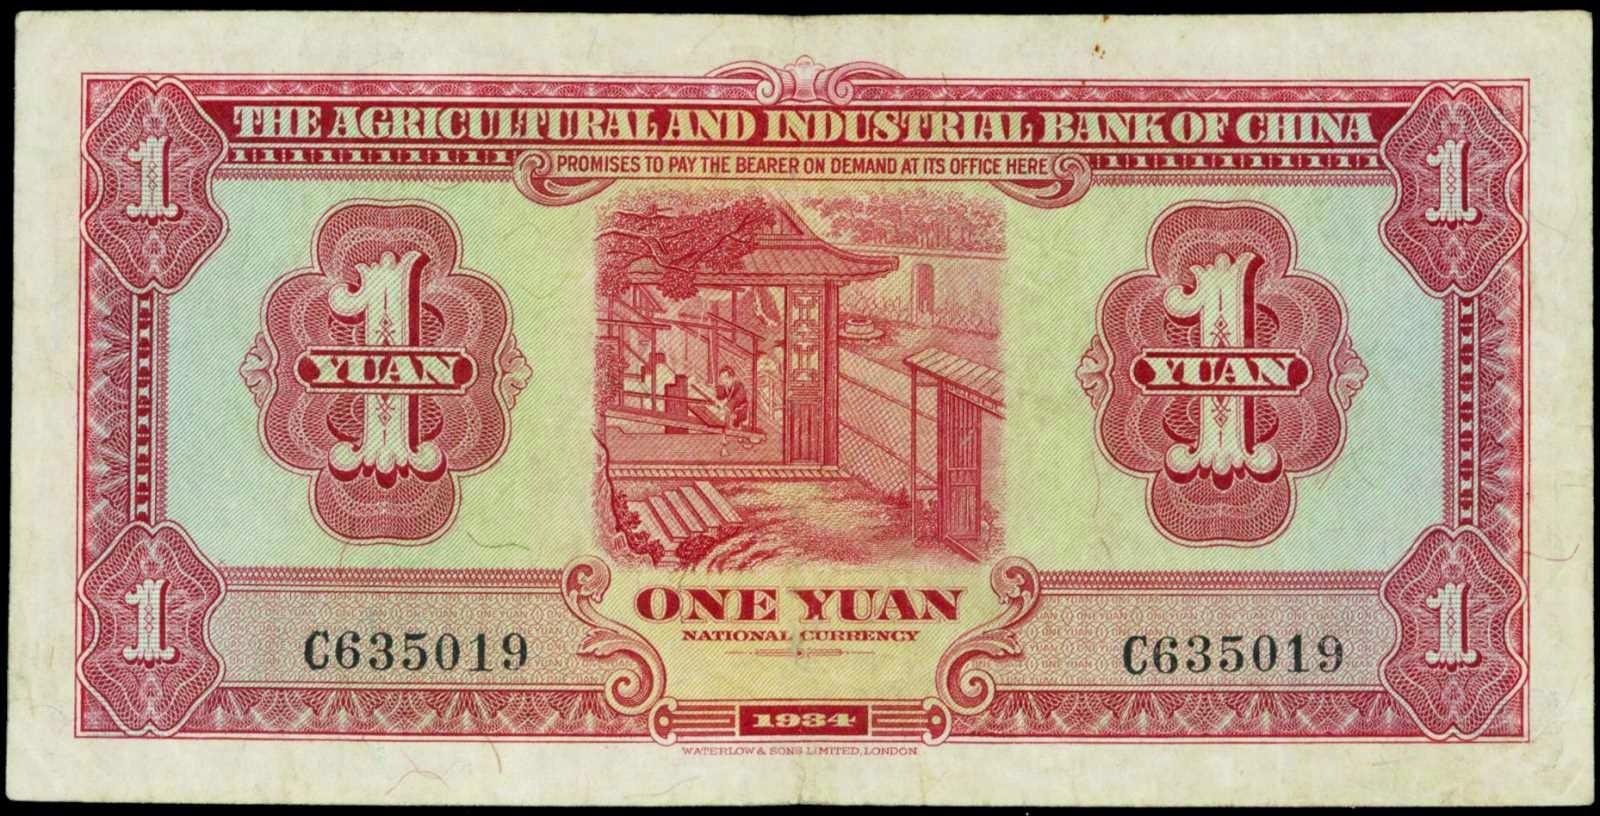 banknotes Yuan Agricultural & Industrial Bank of China